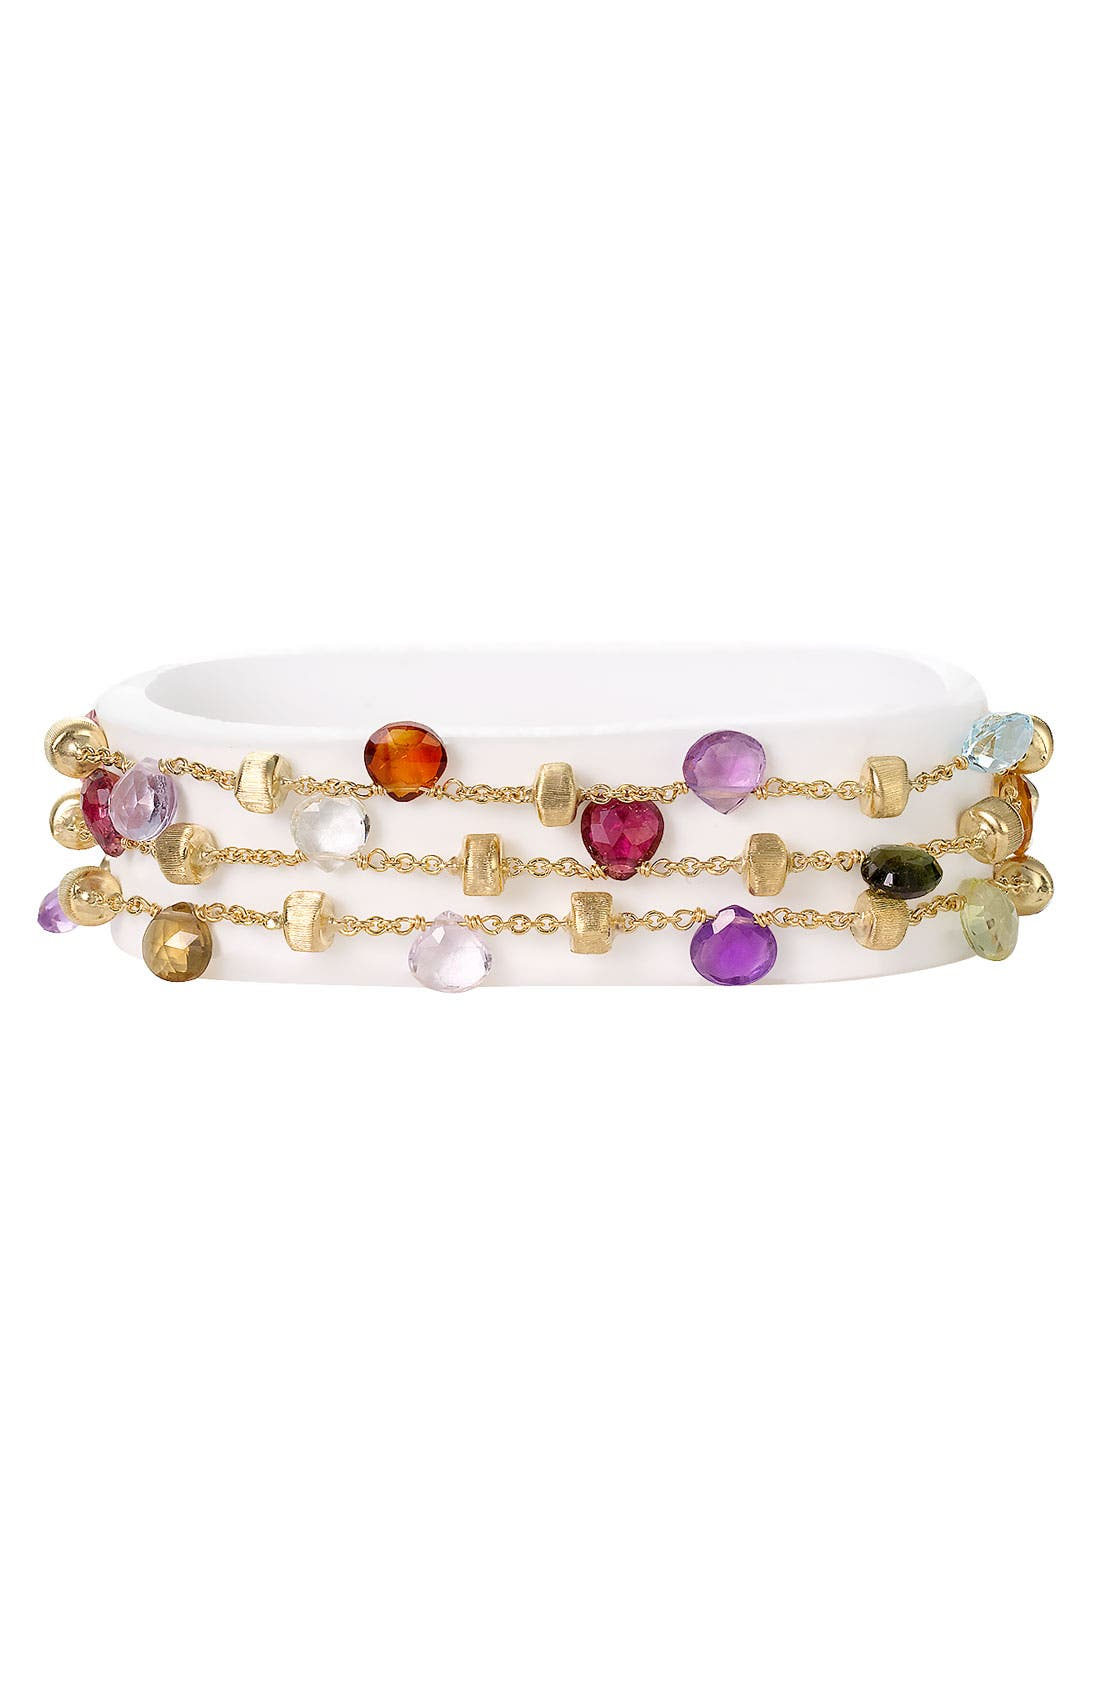 Alternate Image 1 Selected - Marco Bicego 'Paradise' Triple Strand Bracelet